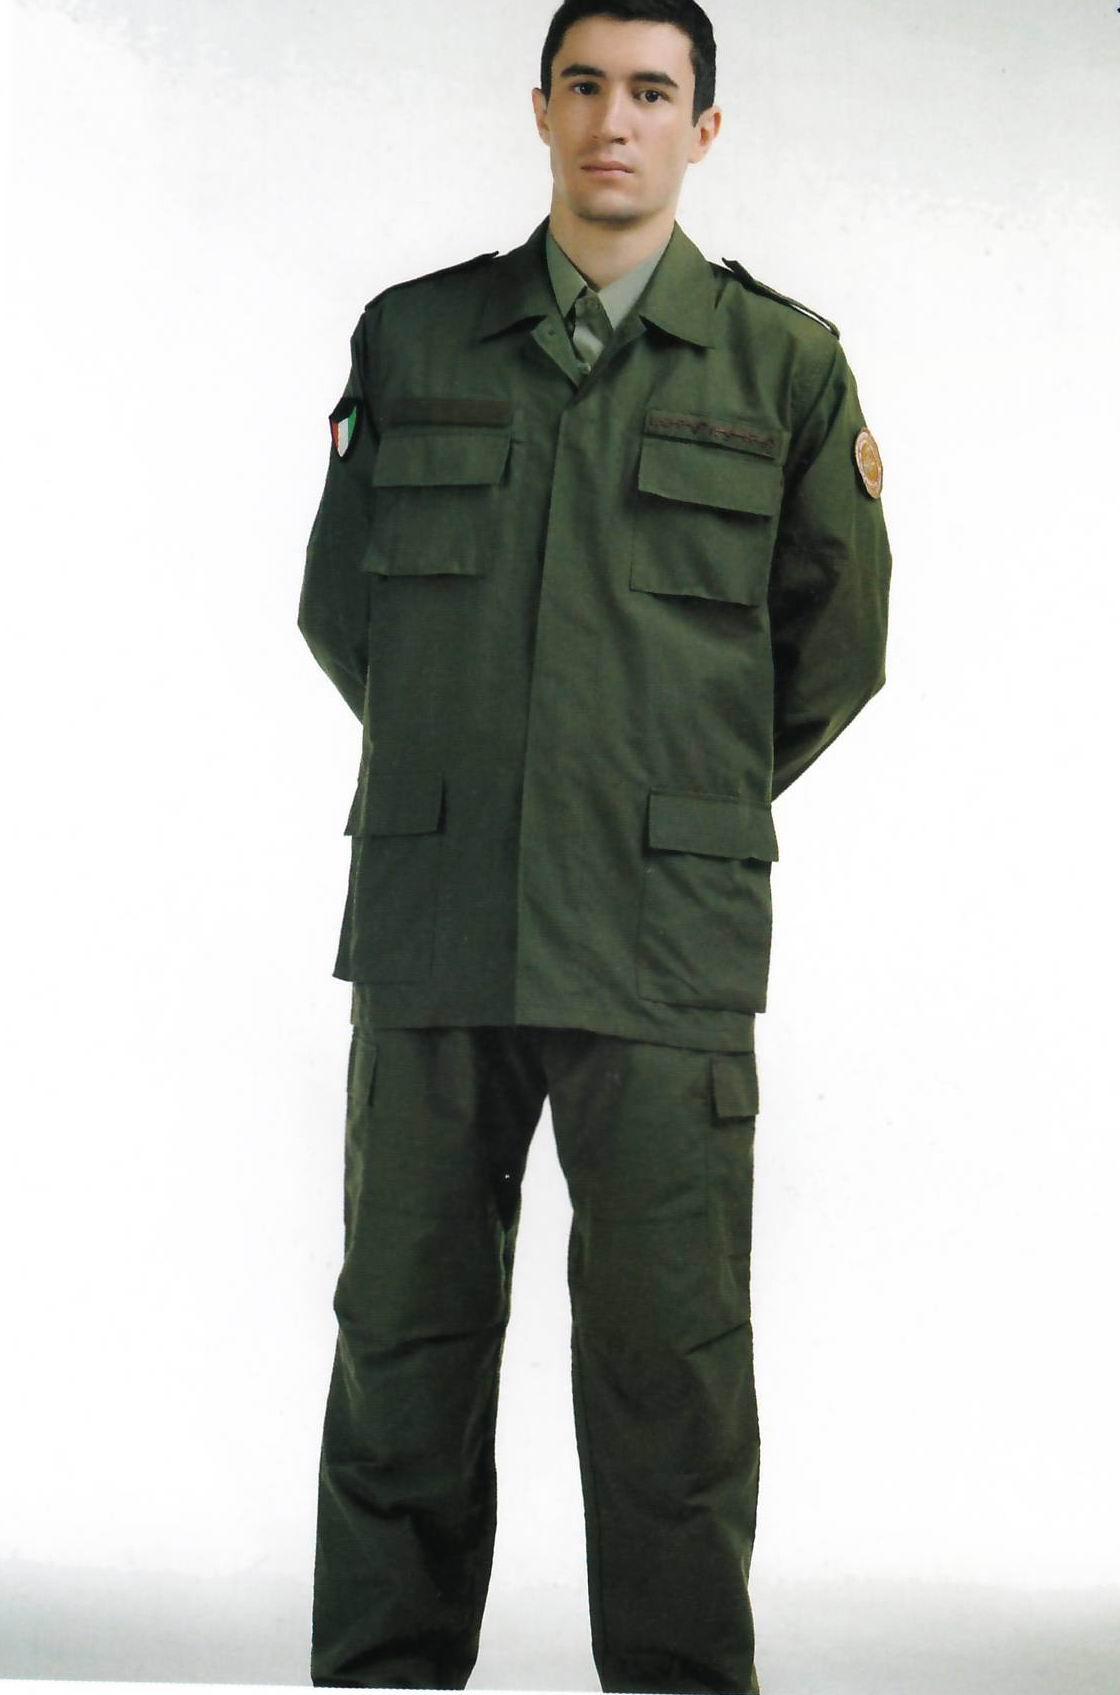 Army Uniform Design 28